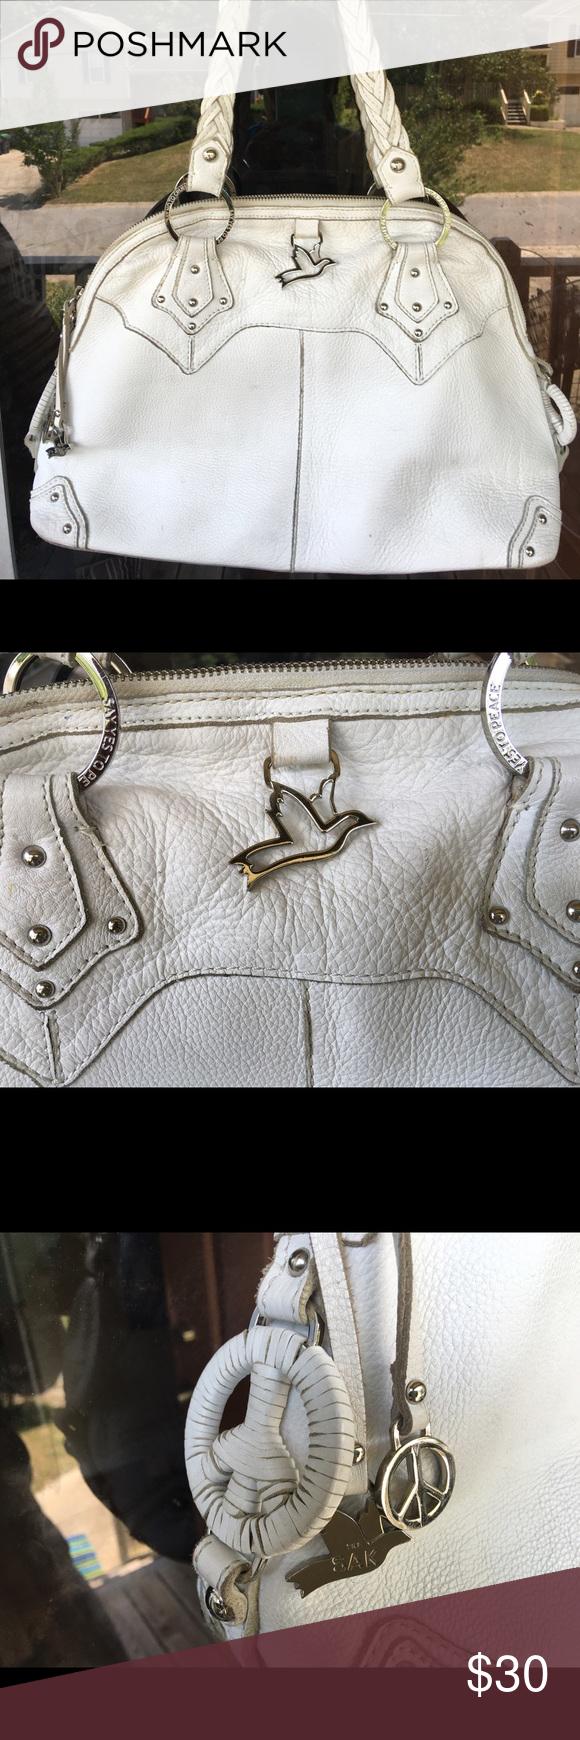 The SAK purse The SAK white leather handbag in great condition! The Sak Bags Shoulder Bags